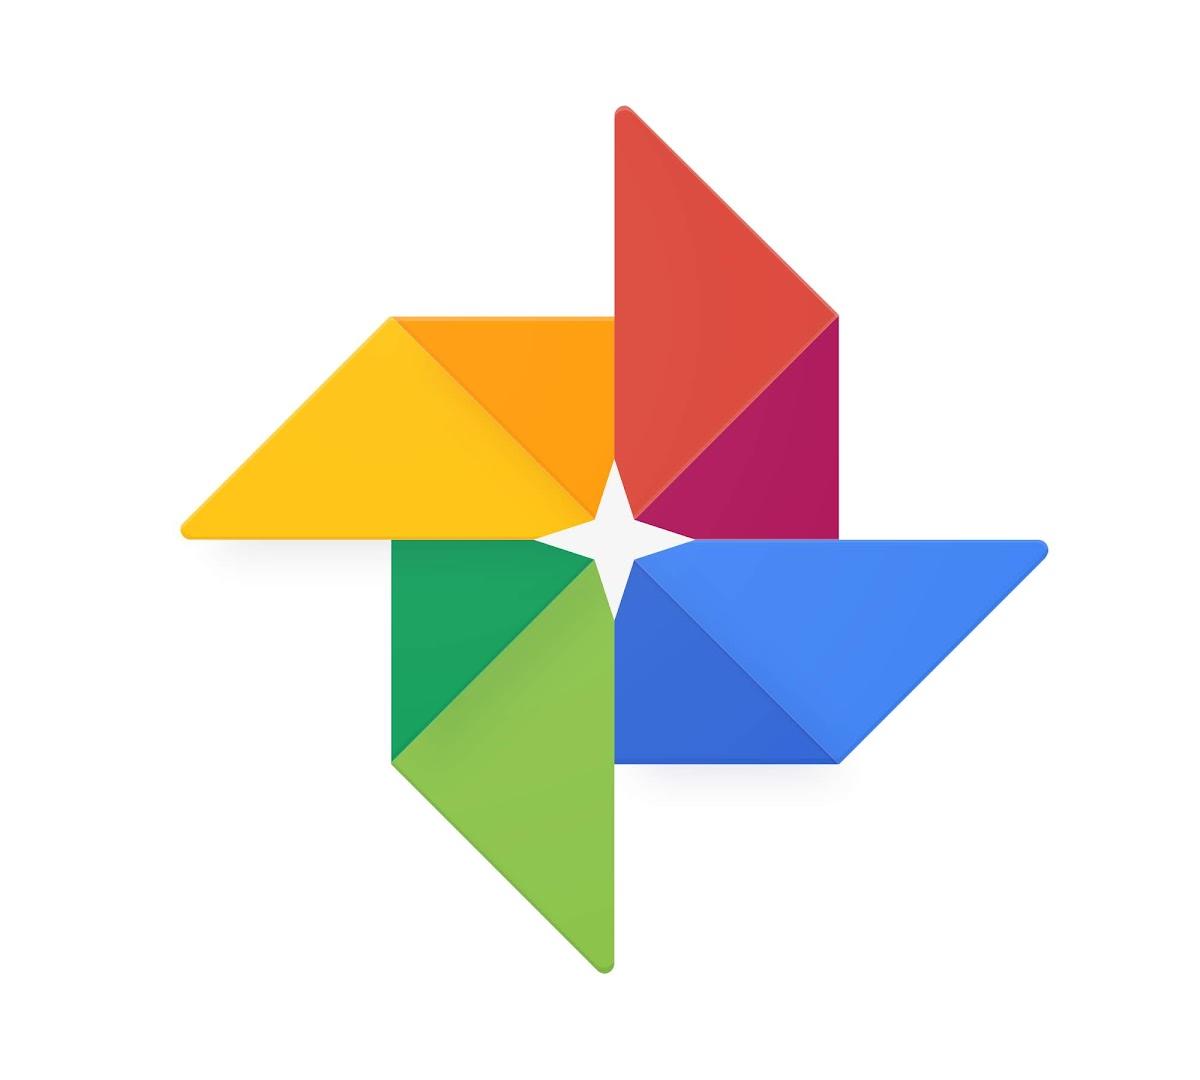 Googleフォト、iPhoneにオリジナル画質の写真を実質無料で無制限に保存可能にの画像